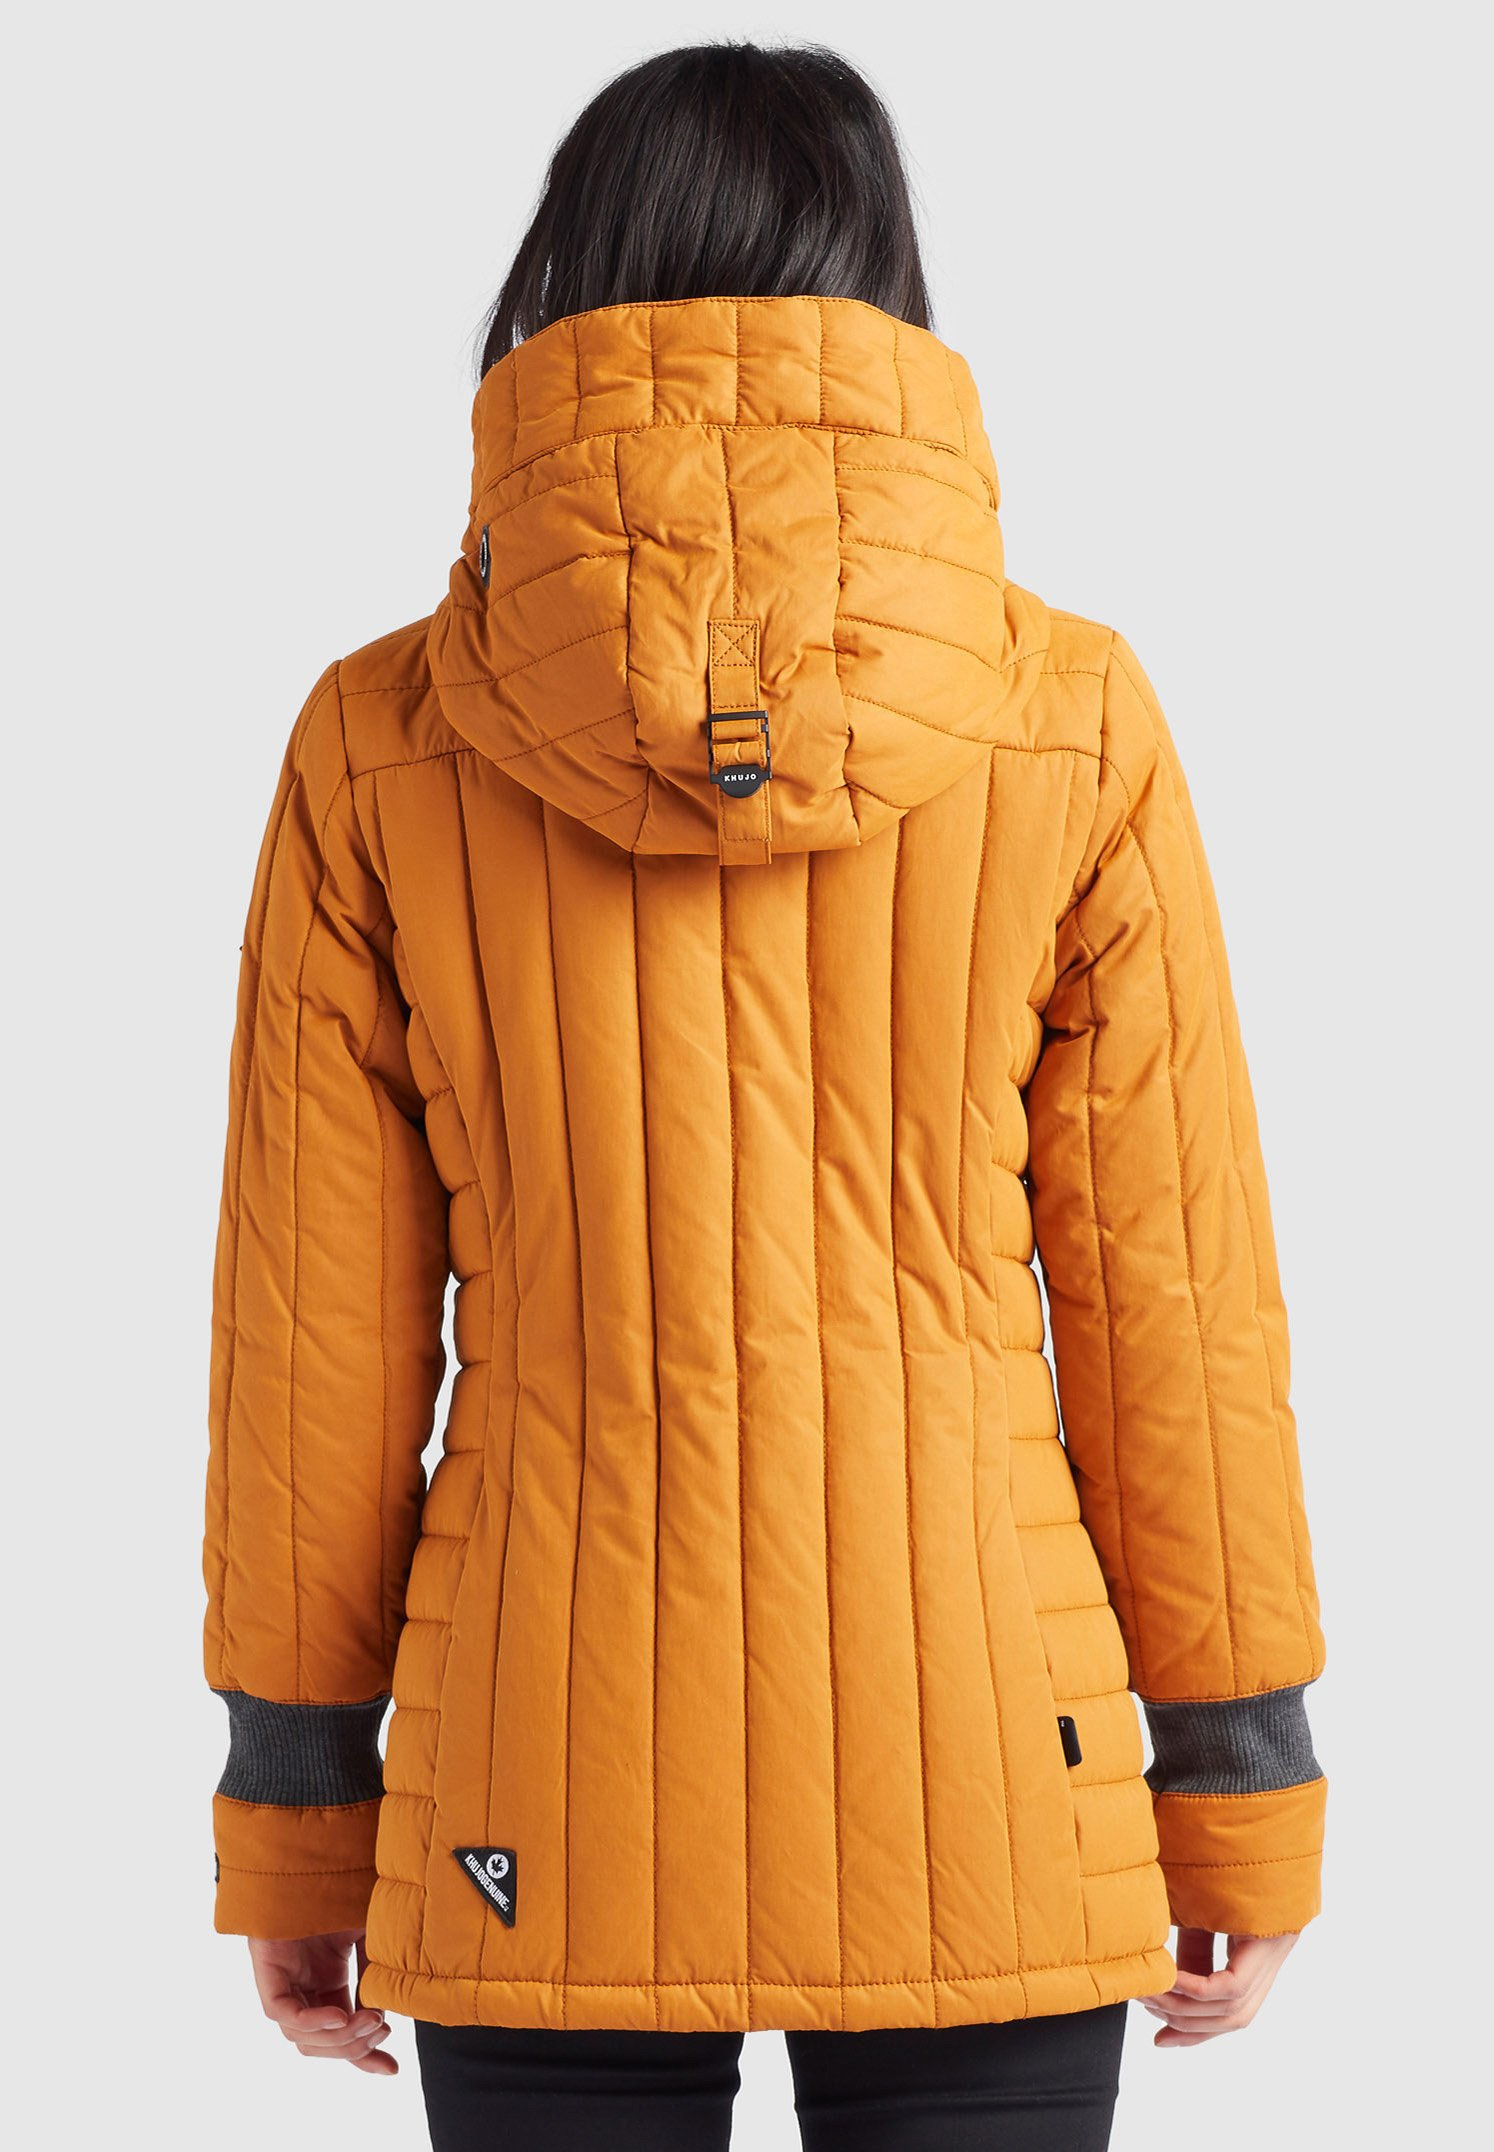 khujo TWEETY PRIME4 Winterjacke karamell/orange